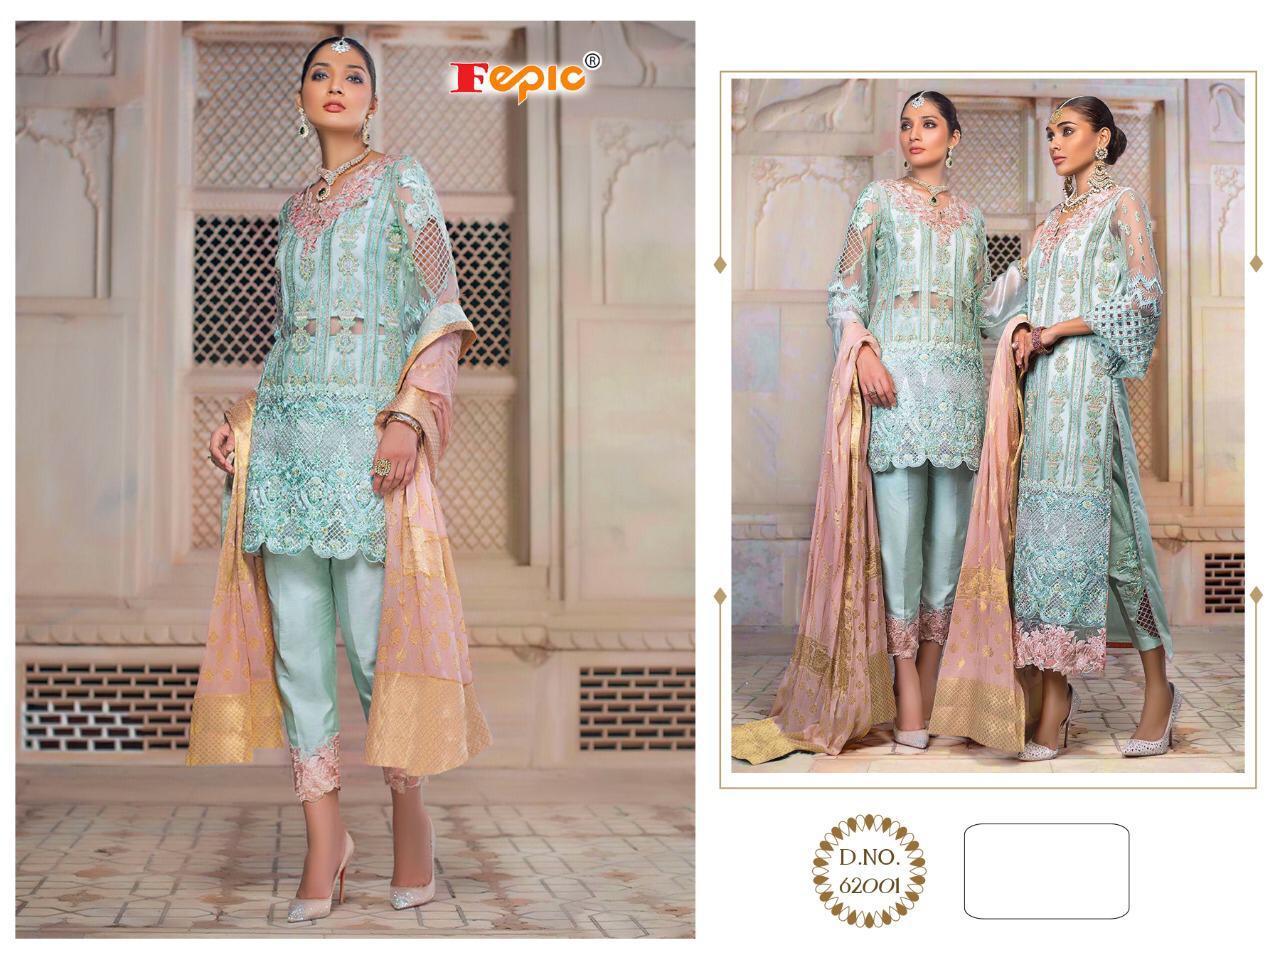 Fepic Designer Pakistani Pettern Partywear Suits In Single Ready Stock